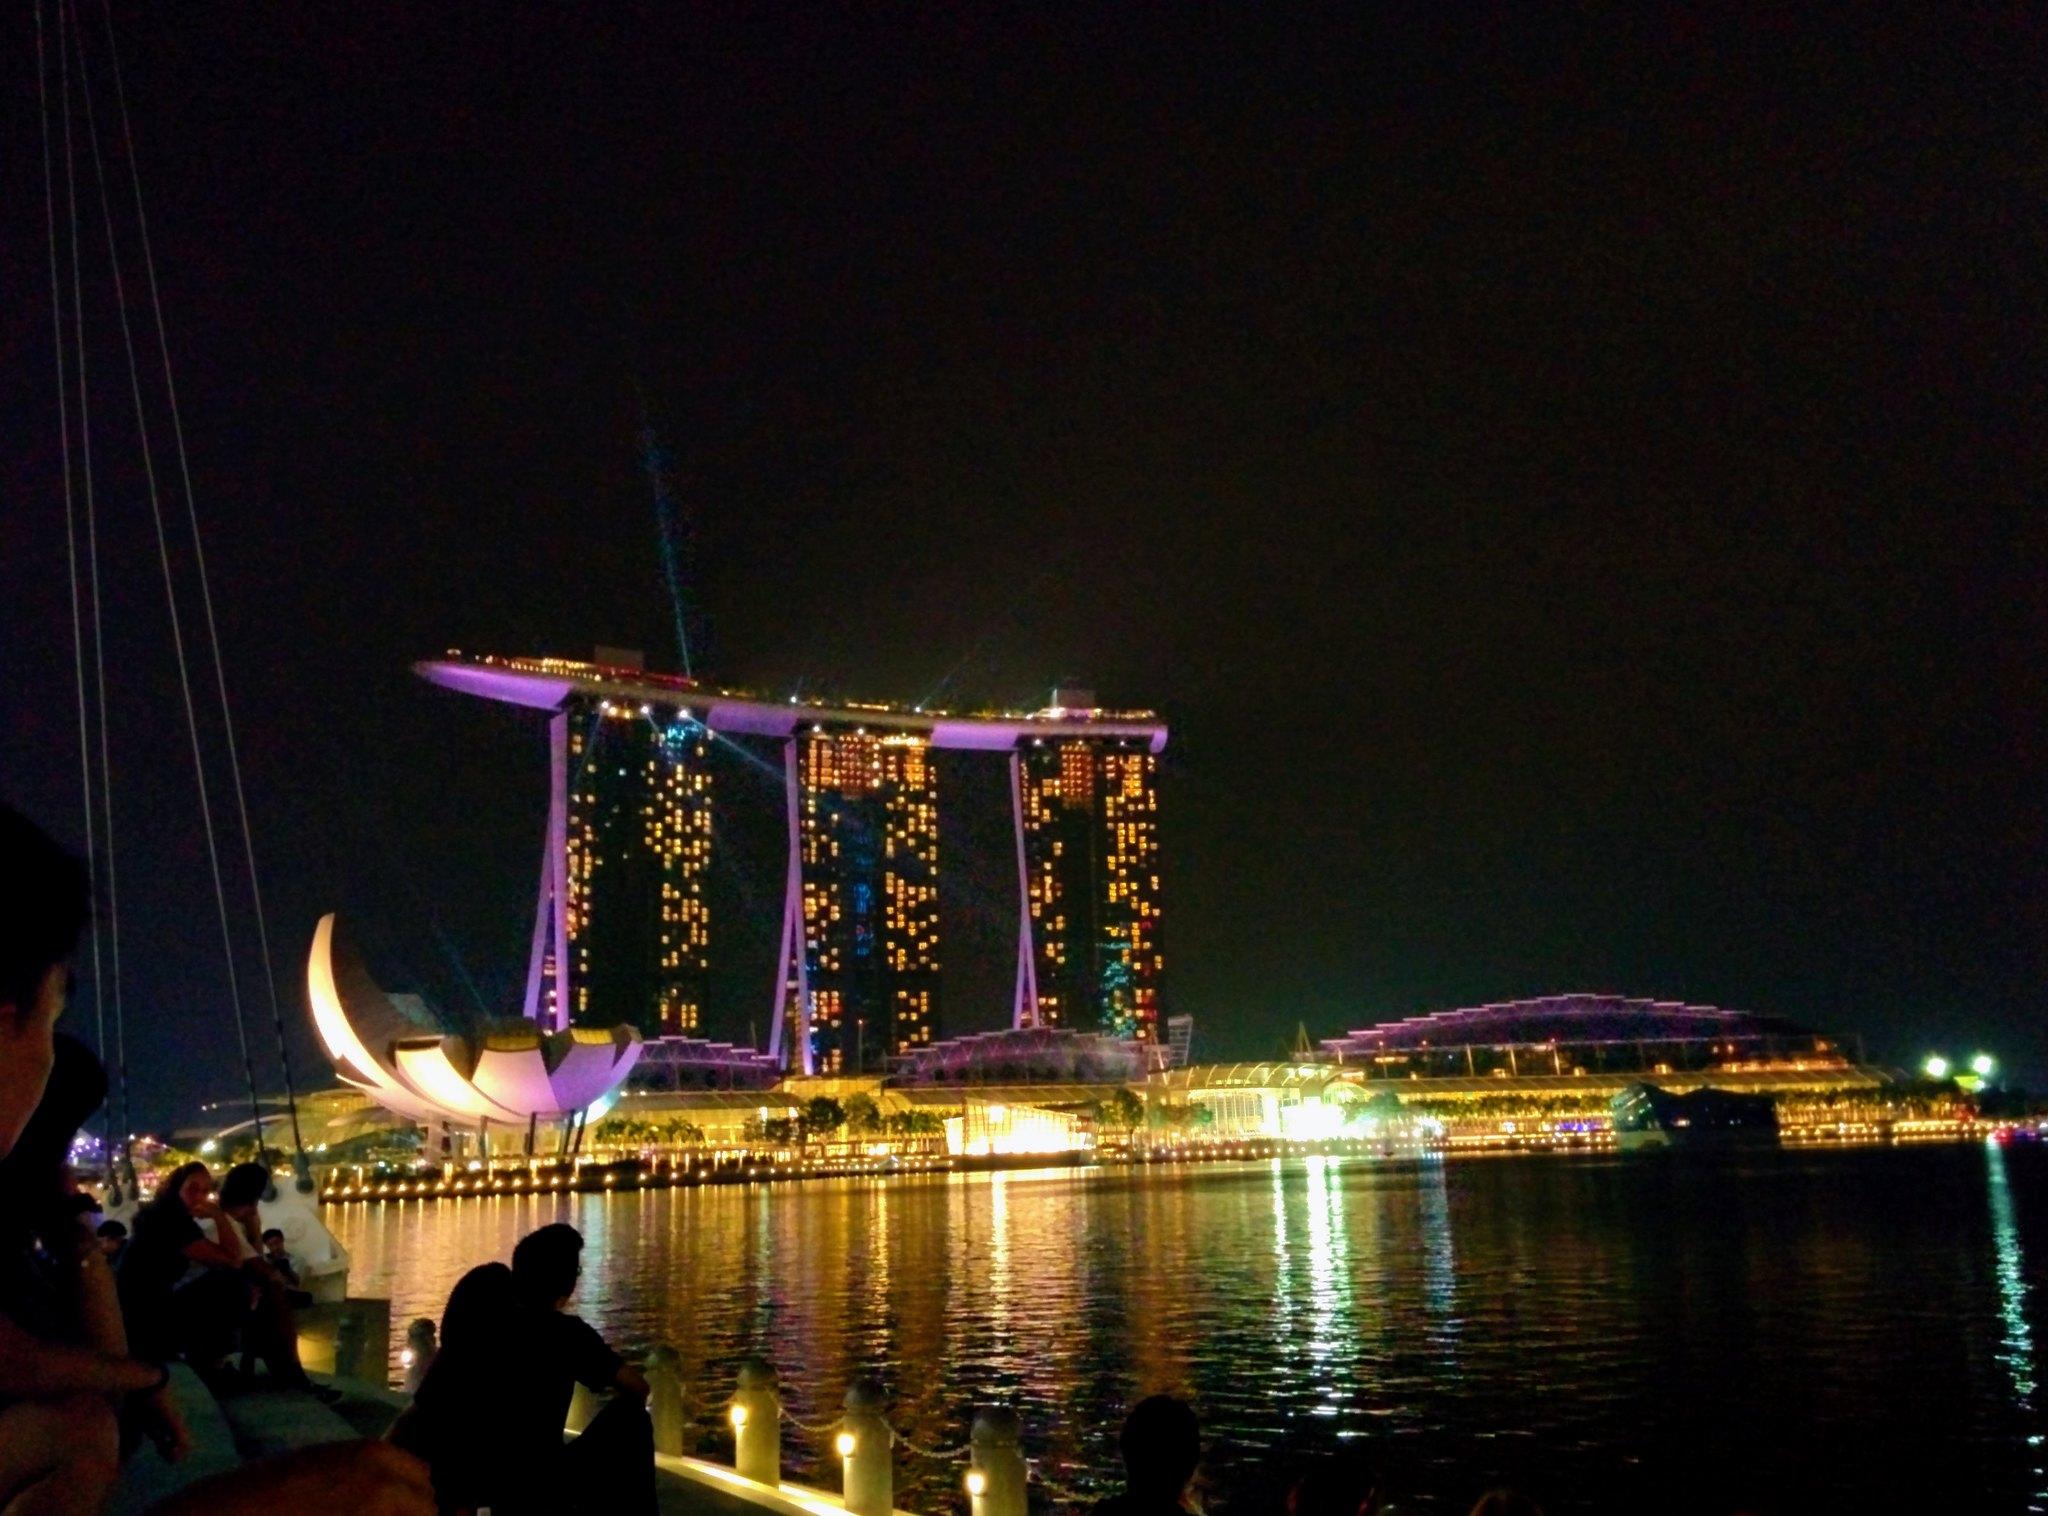 A laser light show across the marina